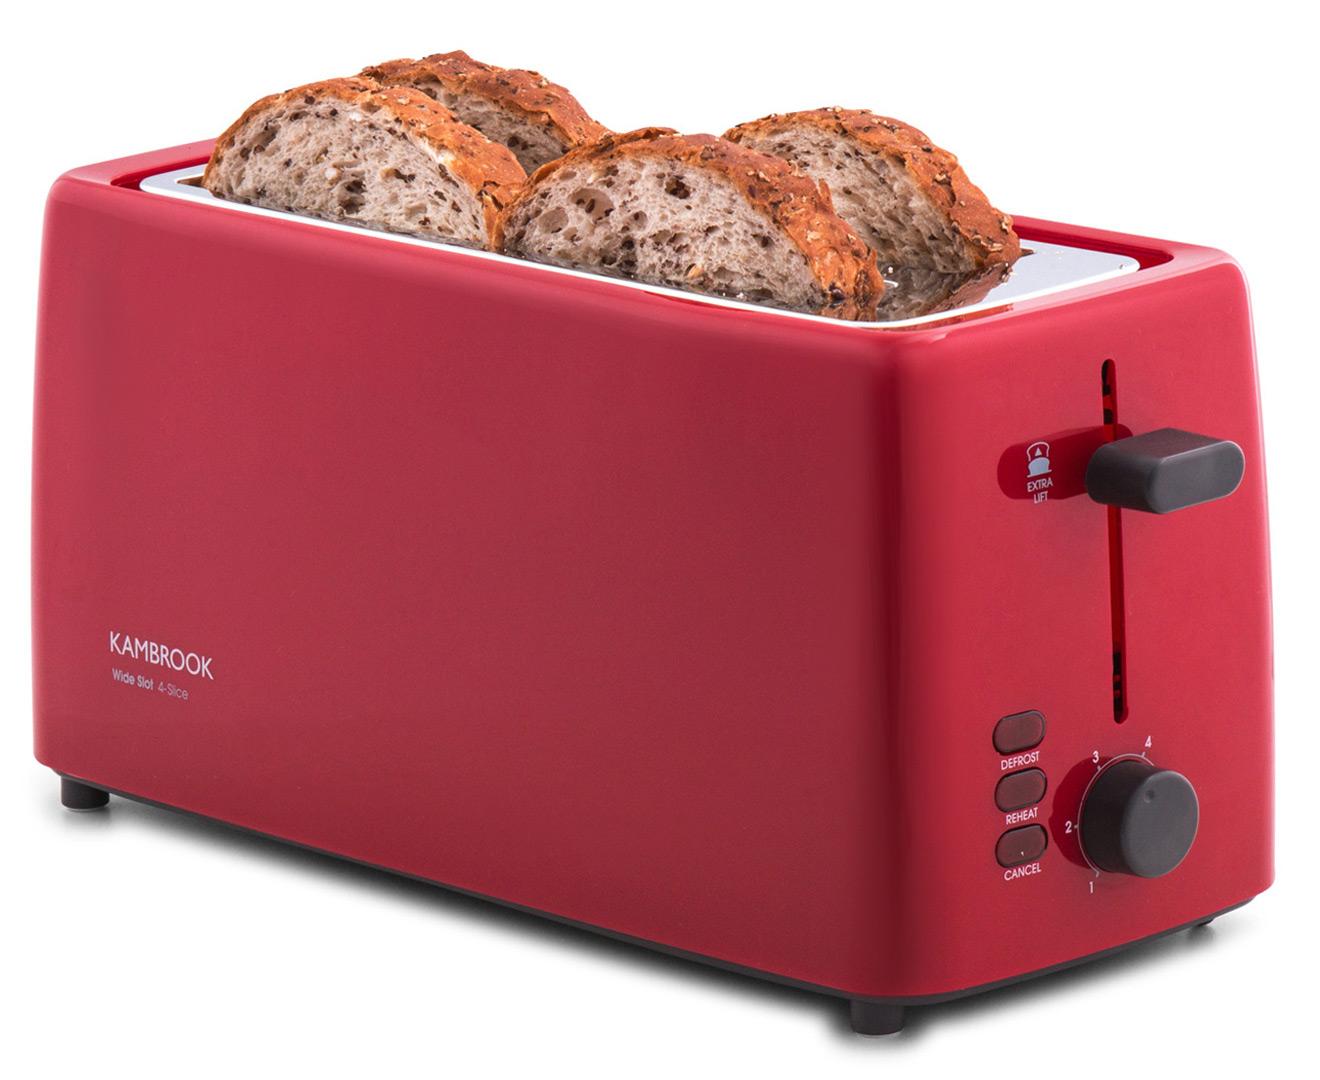 Kambrook Kitchen Appliances